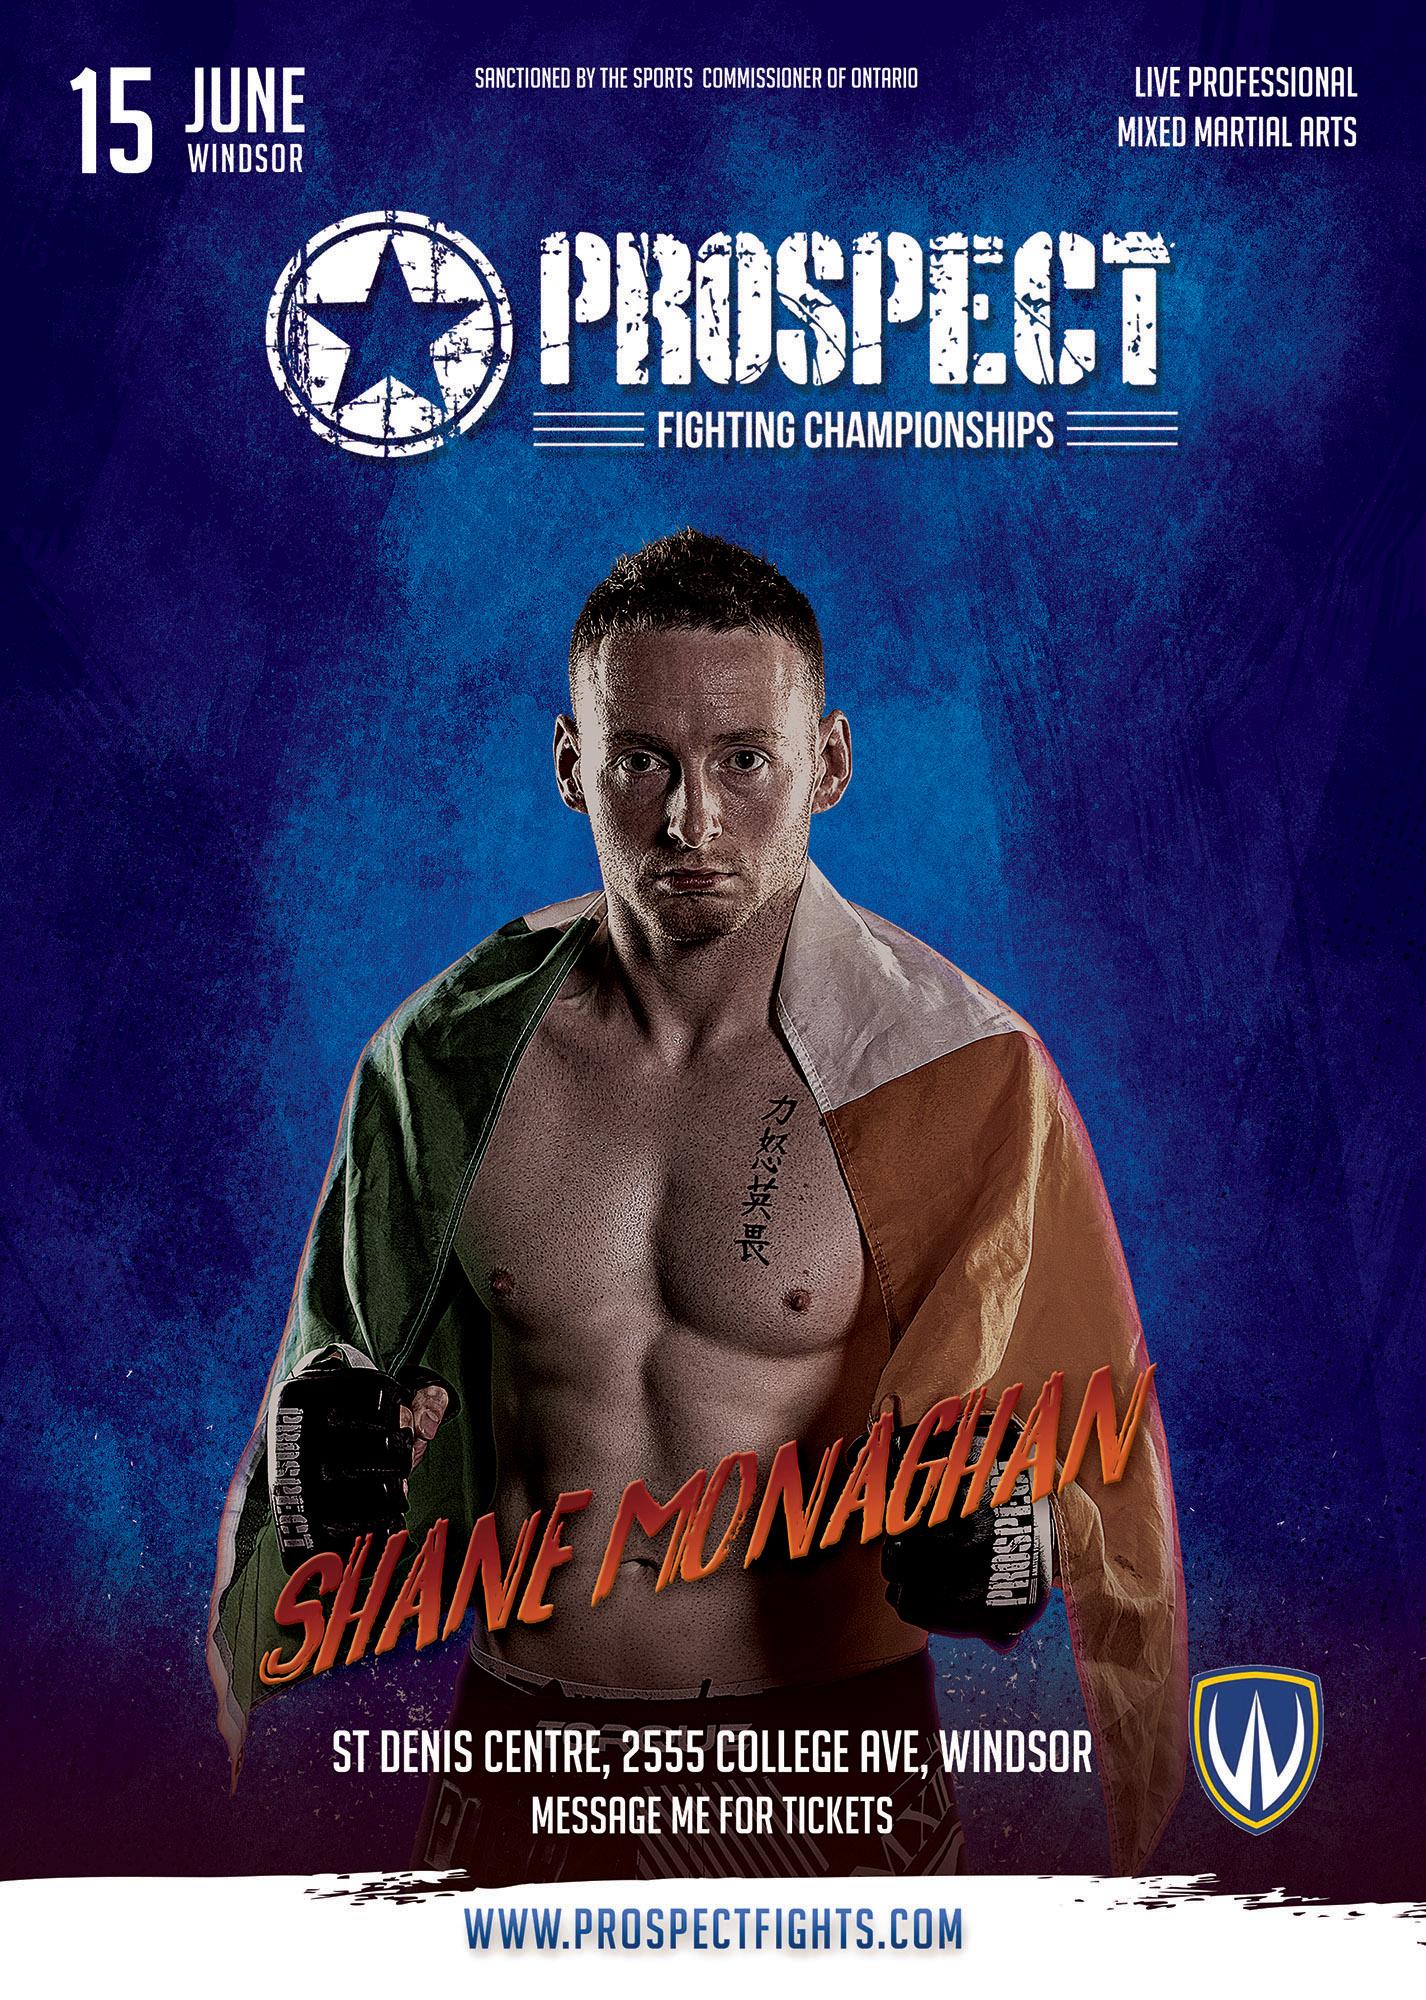 PFC_Shane_Monaghan_web.jpg